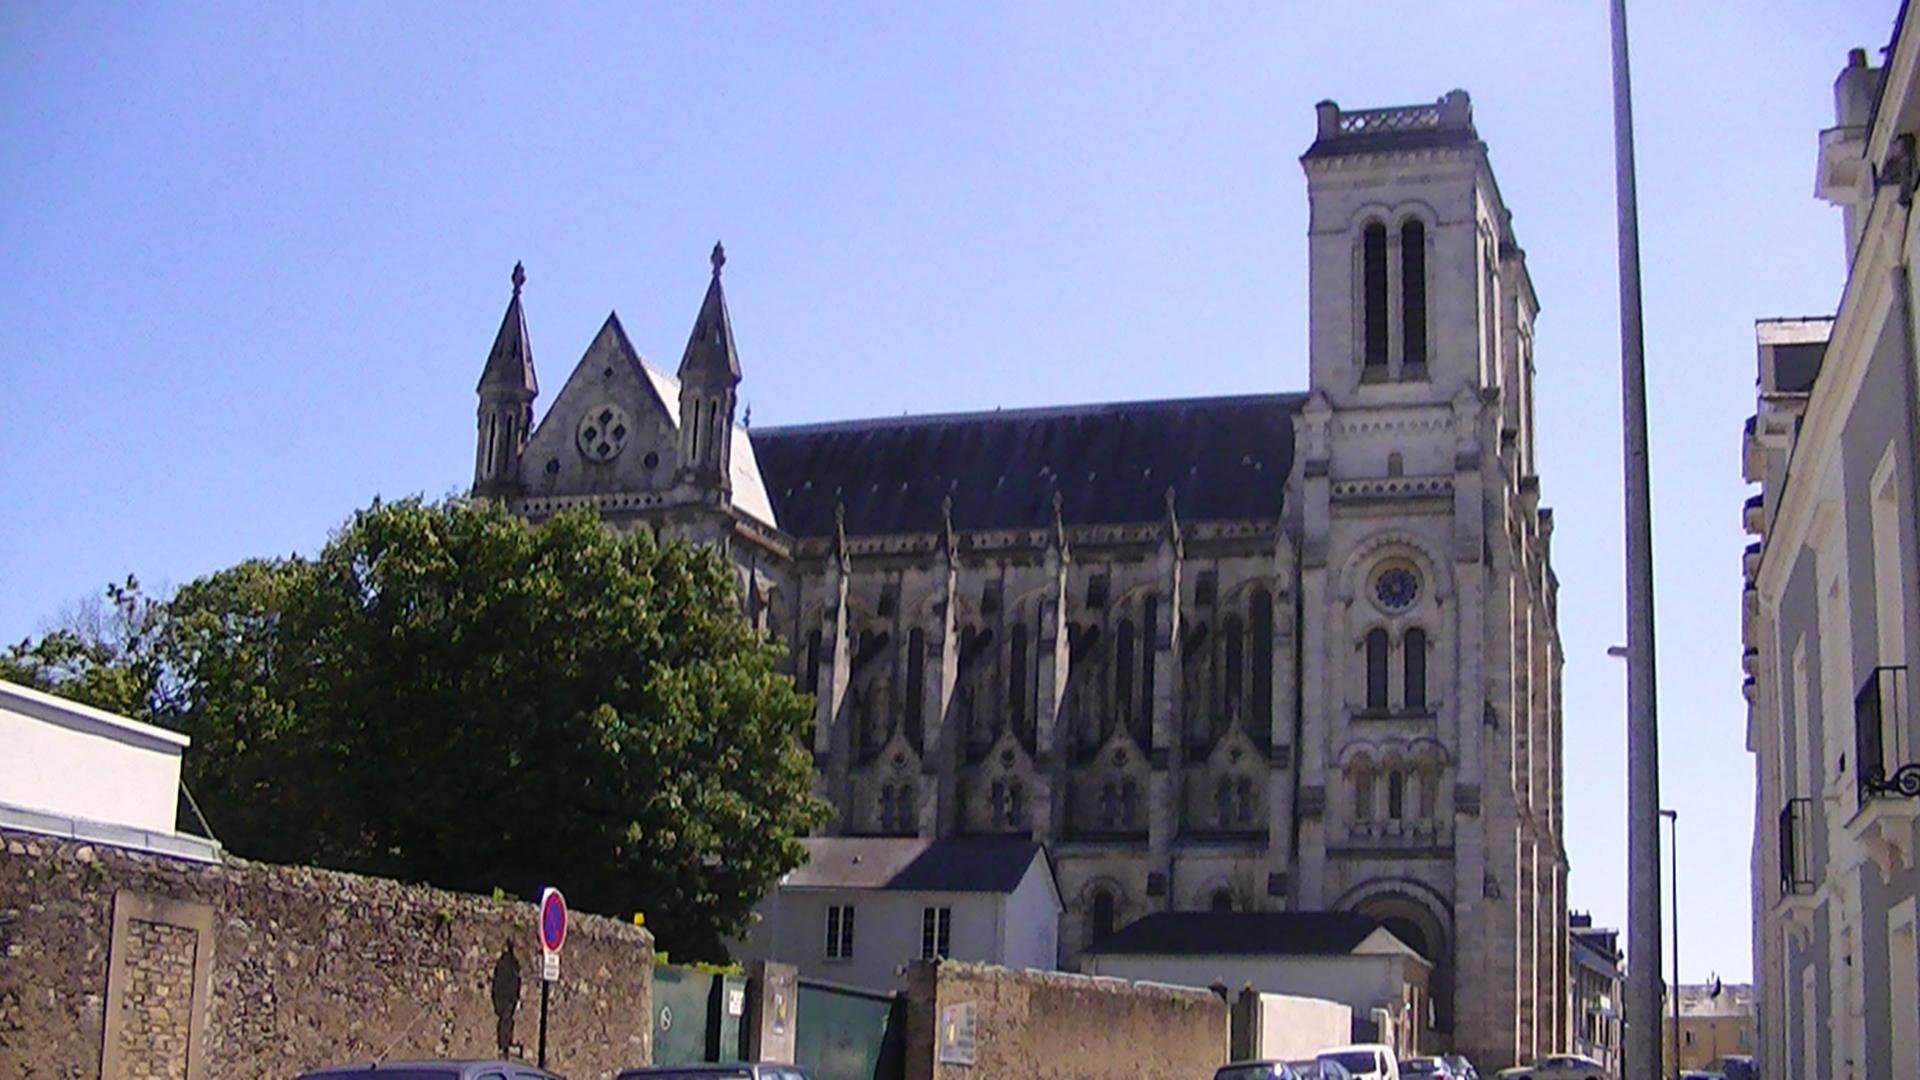 Basilica of Saint Donatien and Saint Rogatien in Nantes (France)